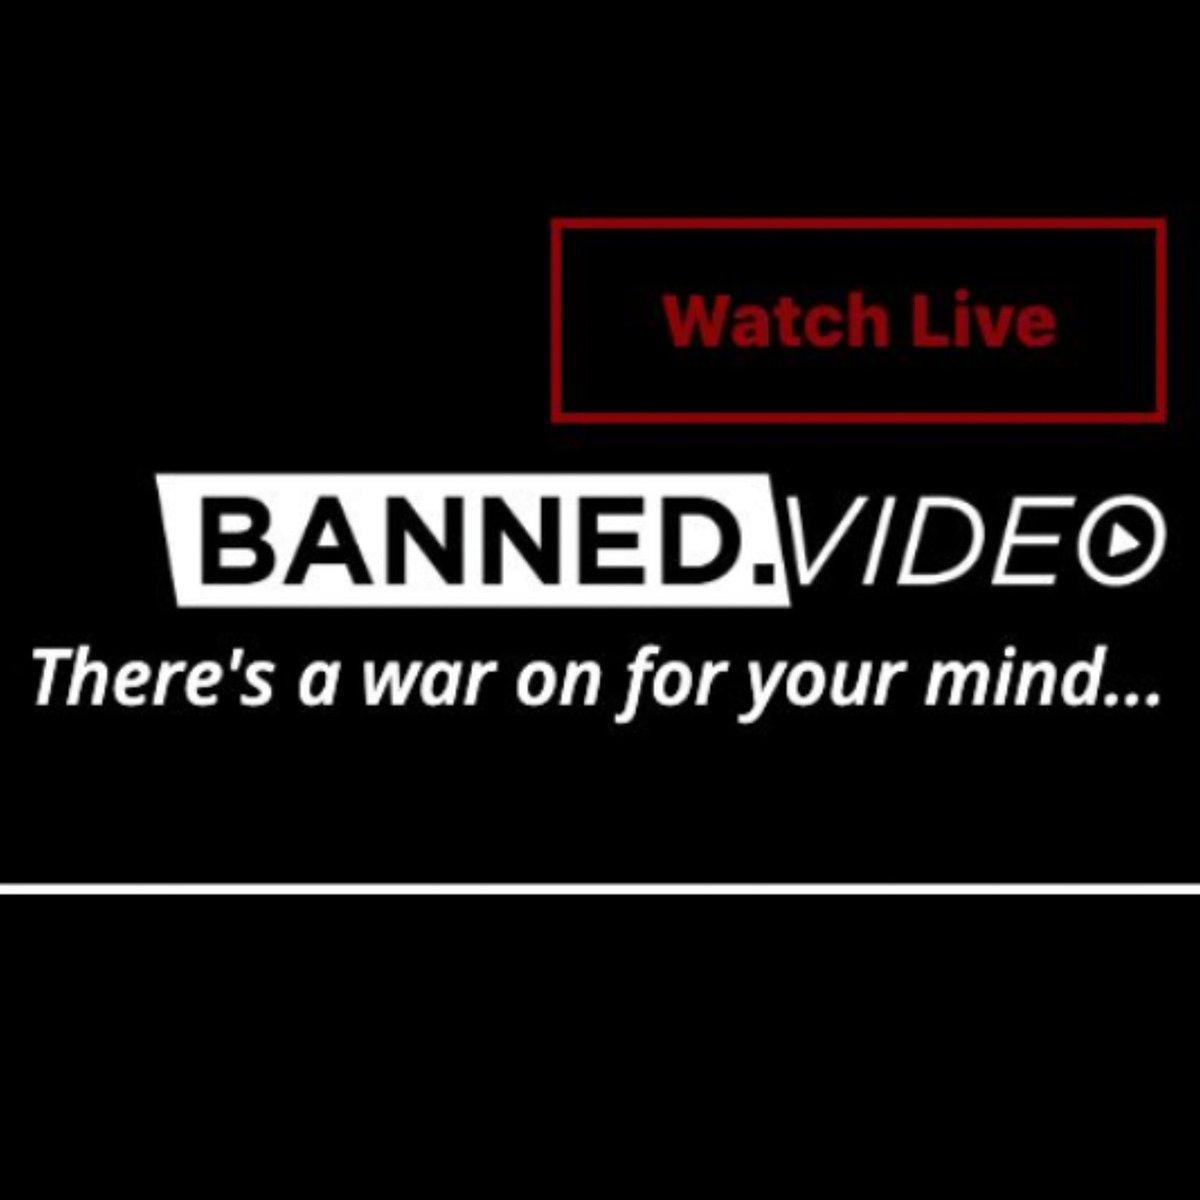 Fake News Media are the REAL threat !    Please visit https://banned.video/   #CNN #MSM #FakeNewsMedia #Coronavirustruth #Covid_19 #tvanouvelles #Canada #Trudeau #Legaultpic.twitter.com/lVlWKzxUkp